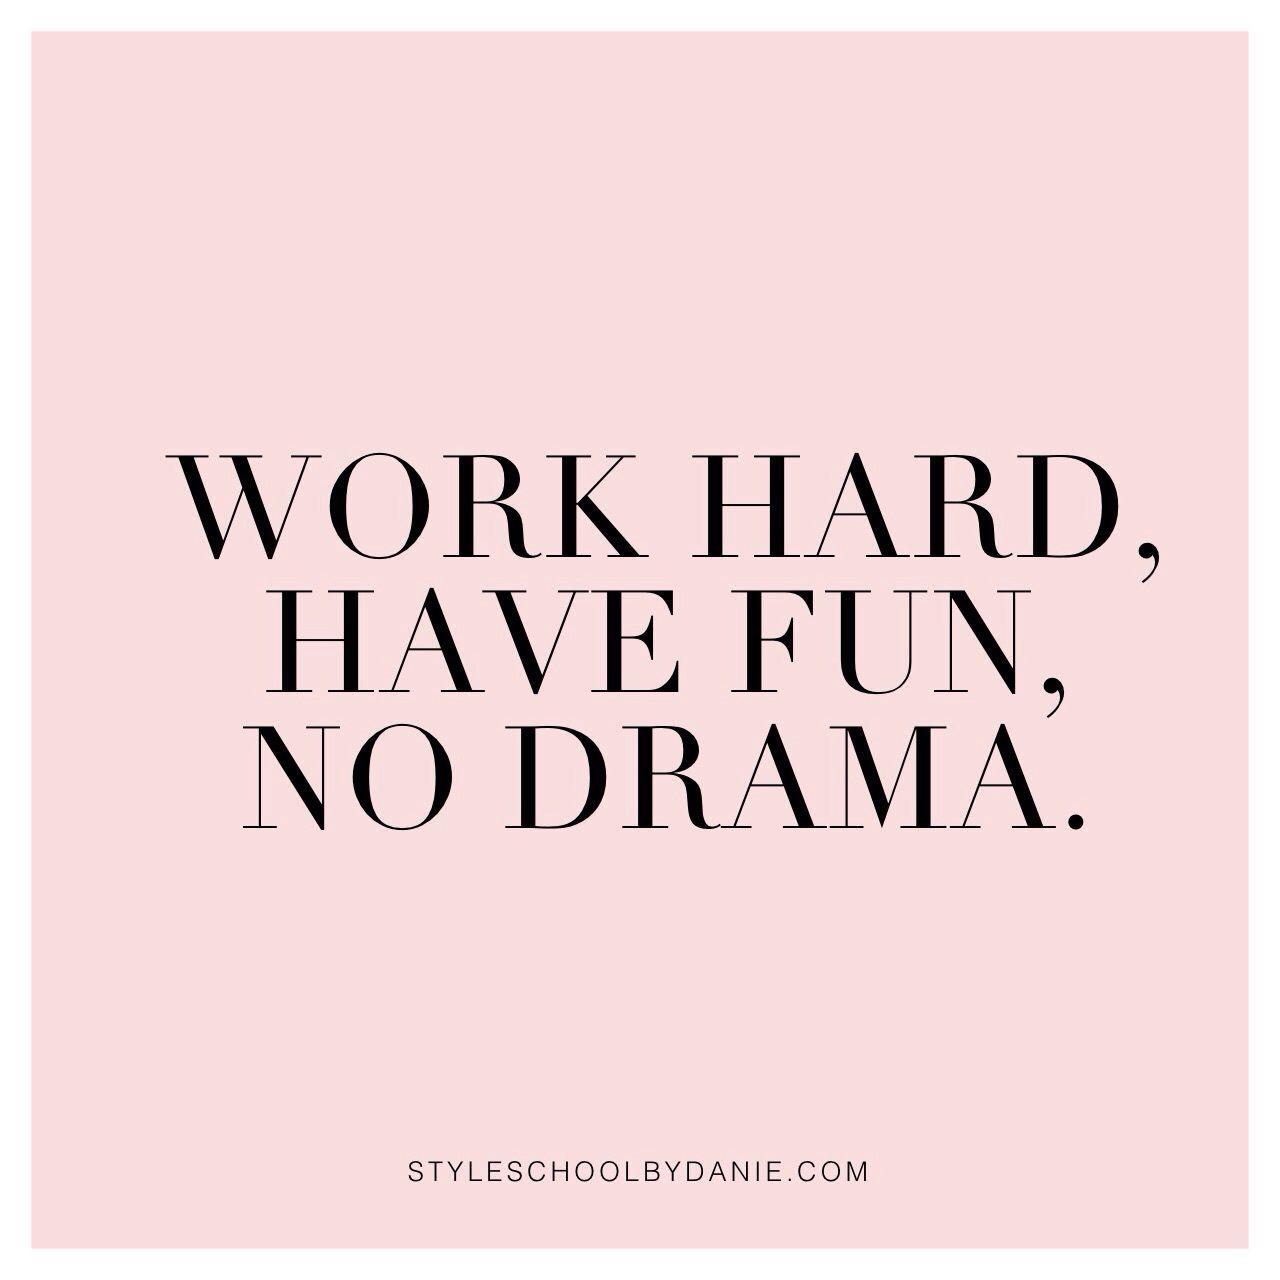 Work hard, have fun, no drama //